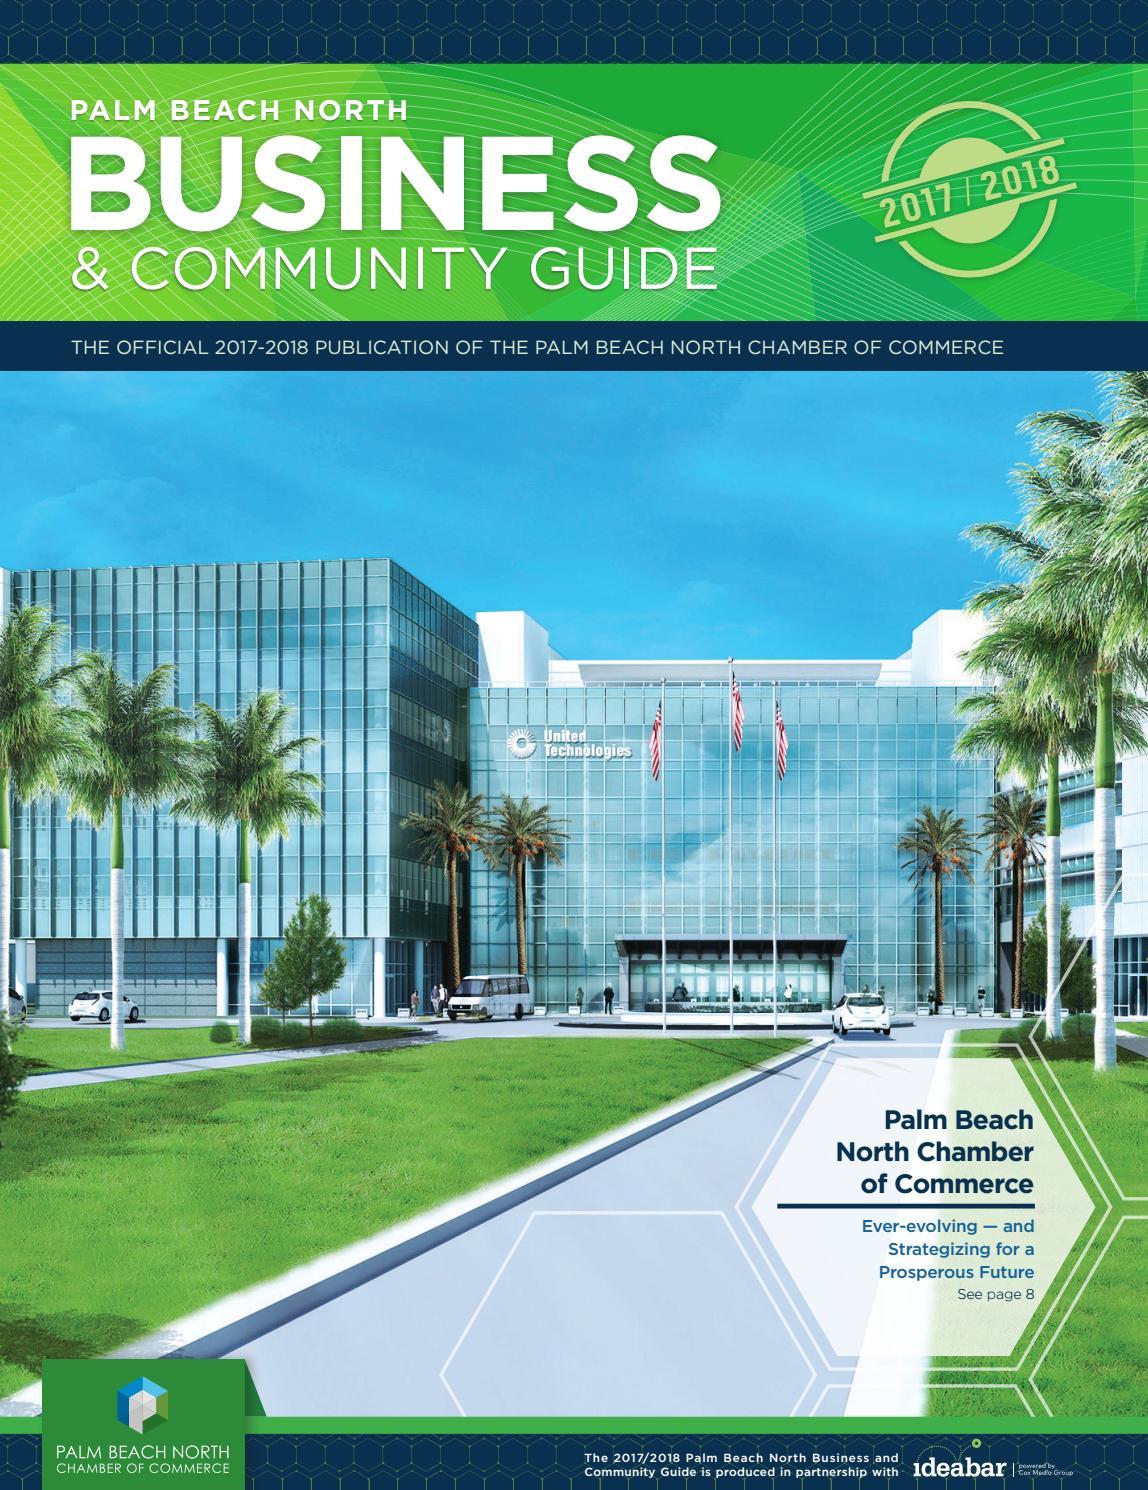 Palm Beach North Business Community